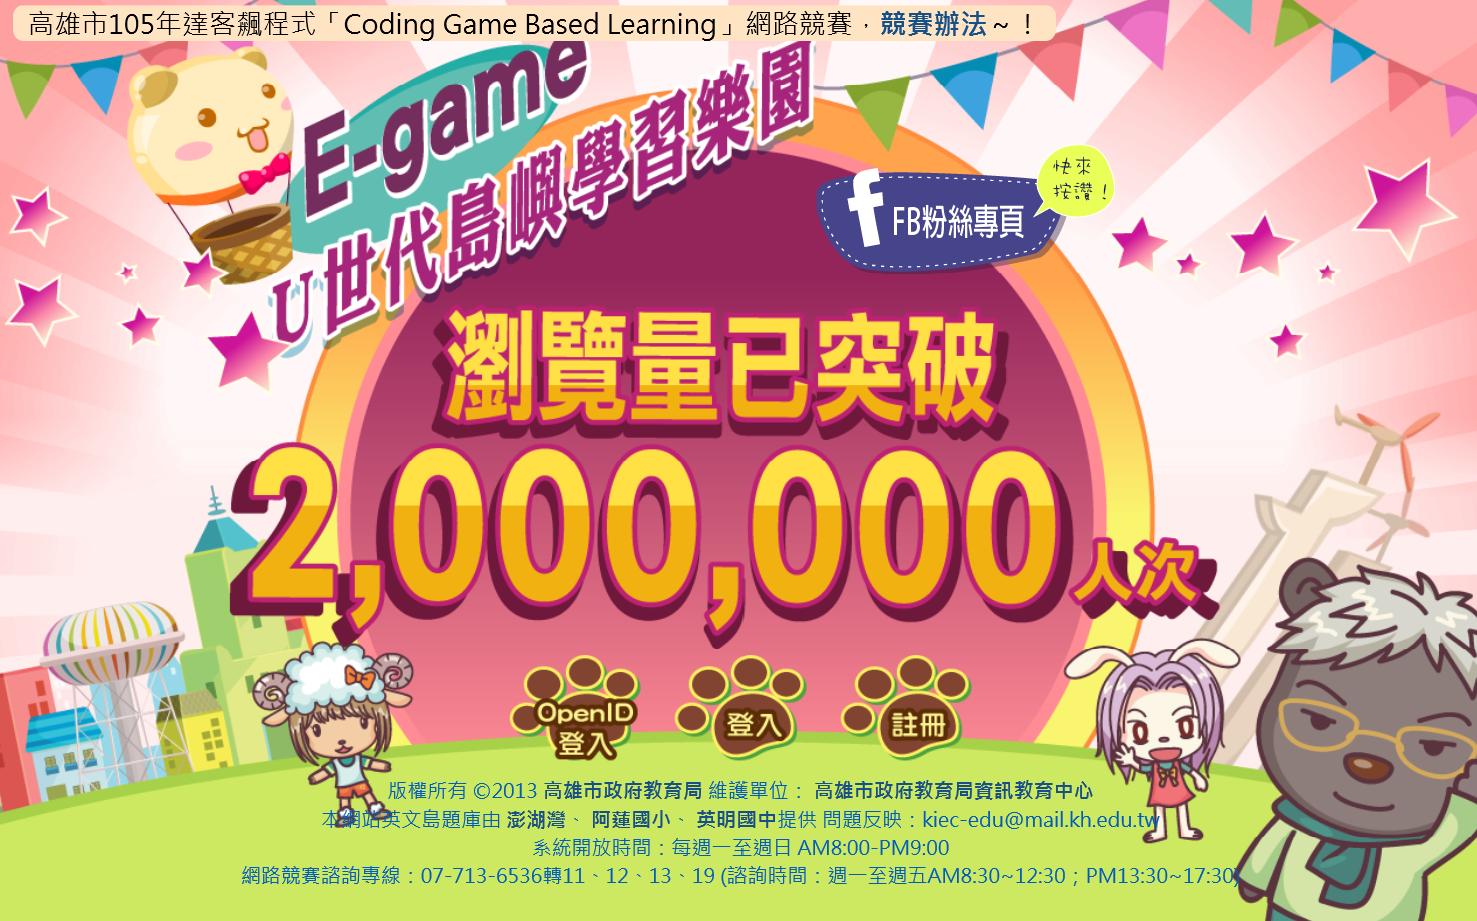 高雄:E-game